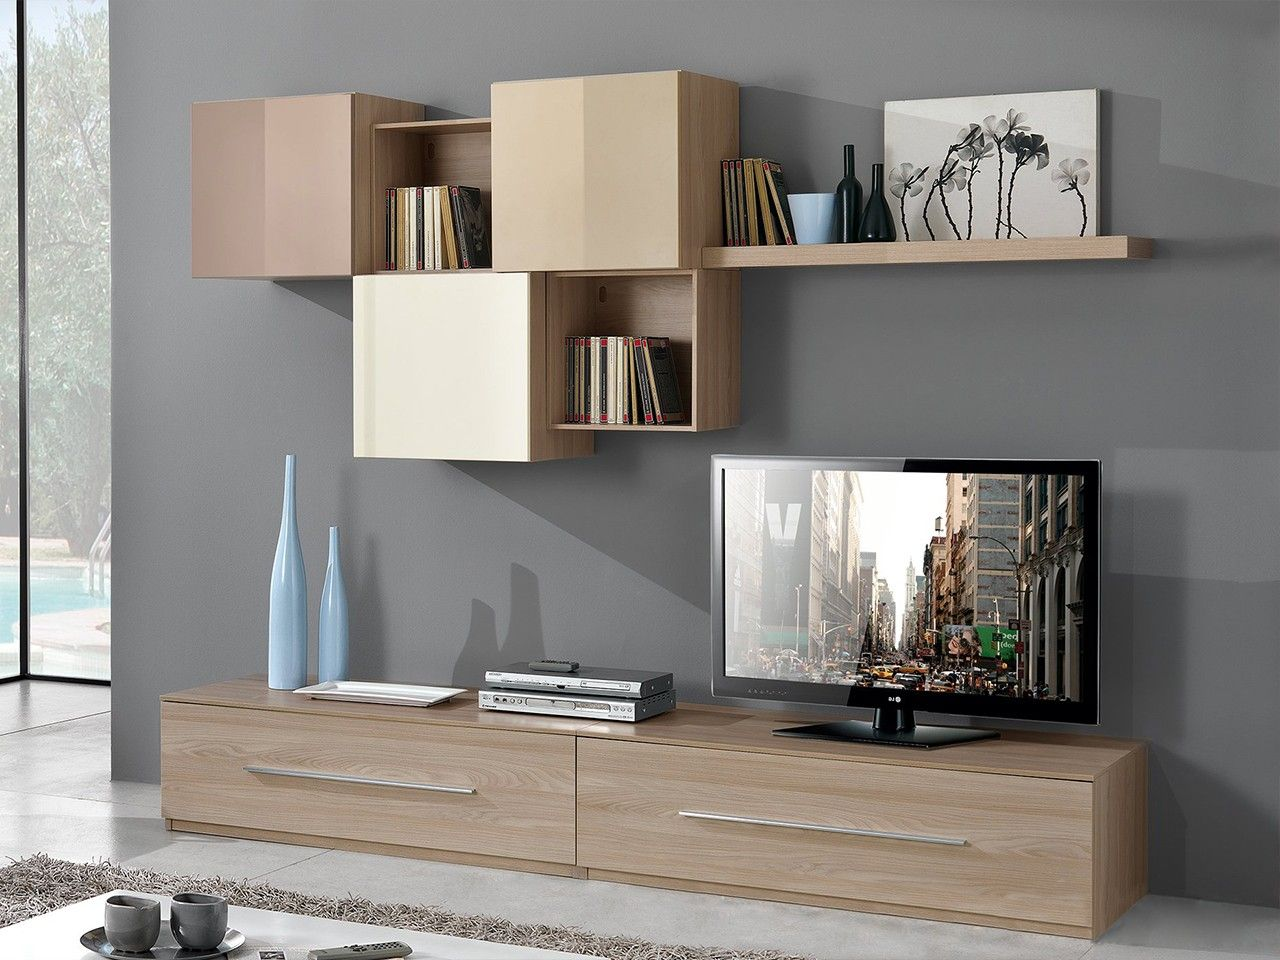 Resultado De Imagen Para Bife Mueble Moderno Casa Pinterest  # Muebles Modernos